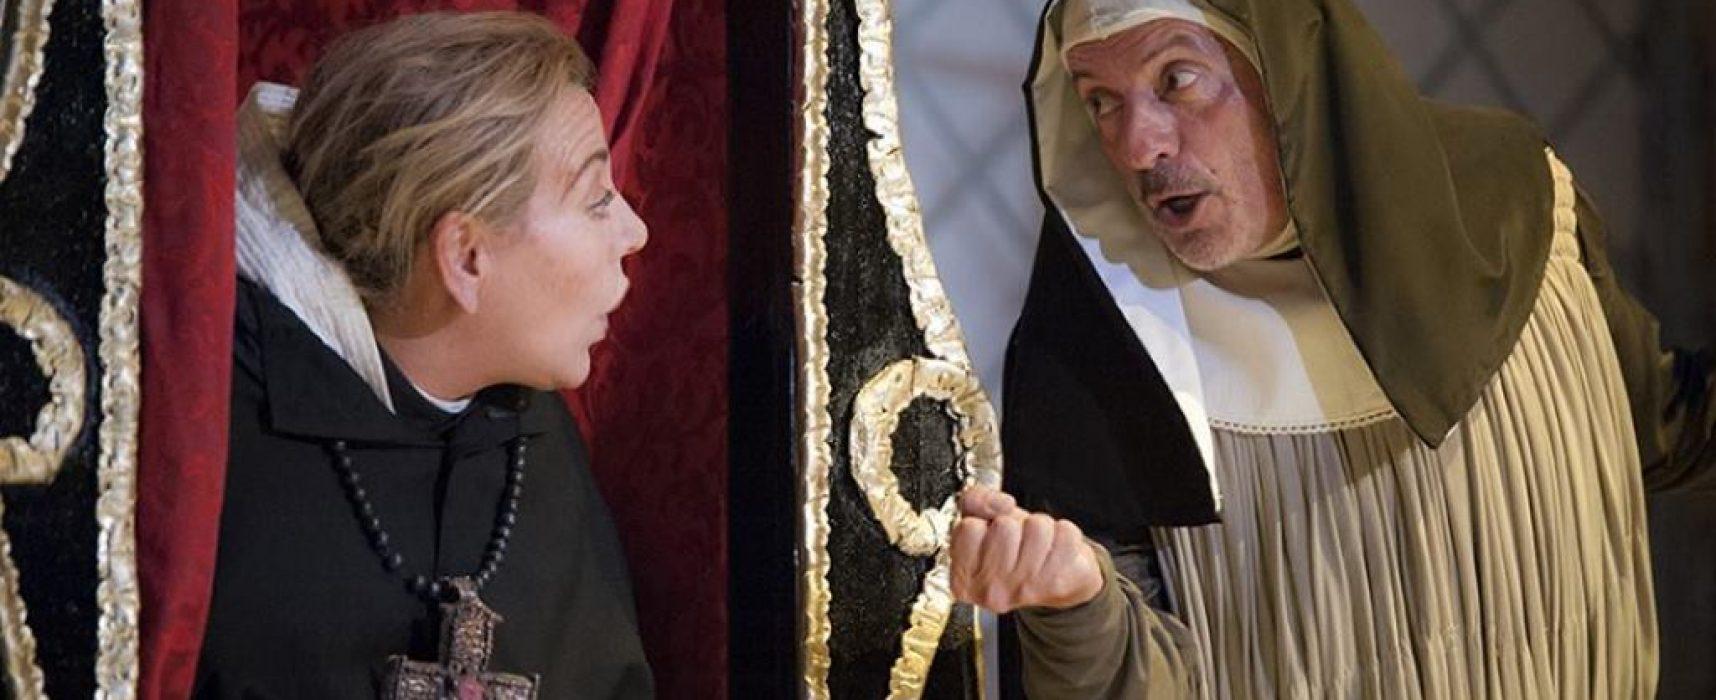 Napoli, The Beggar's Theatre Lli Ssantarelle